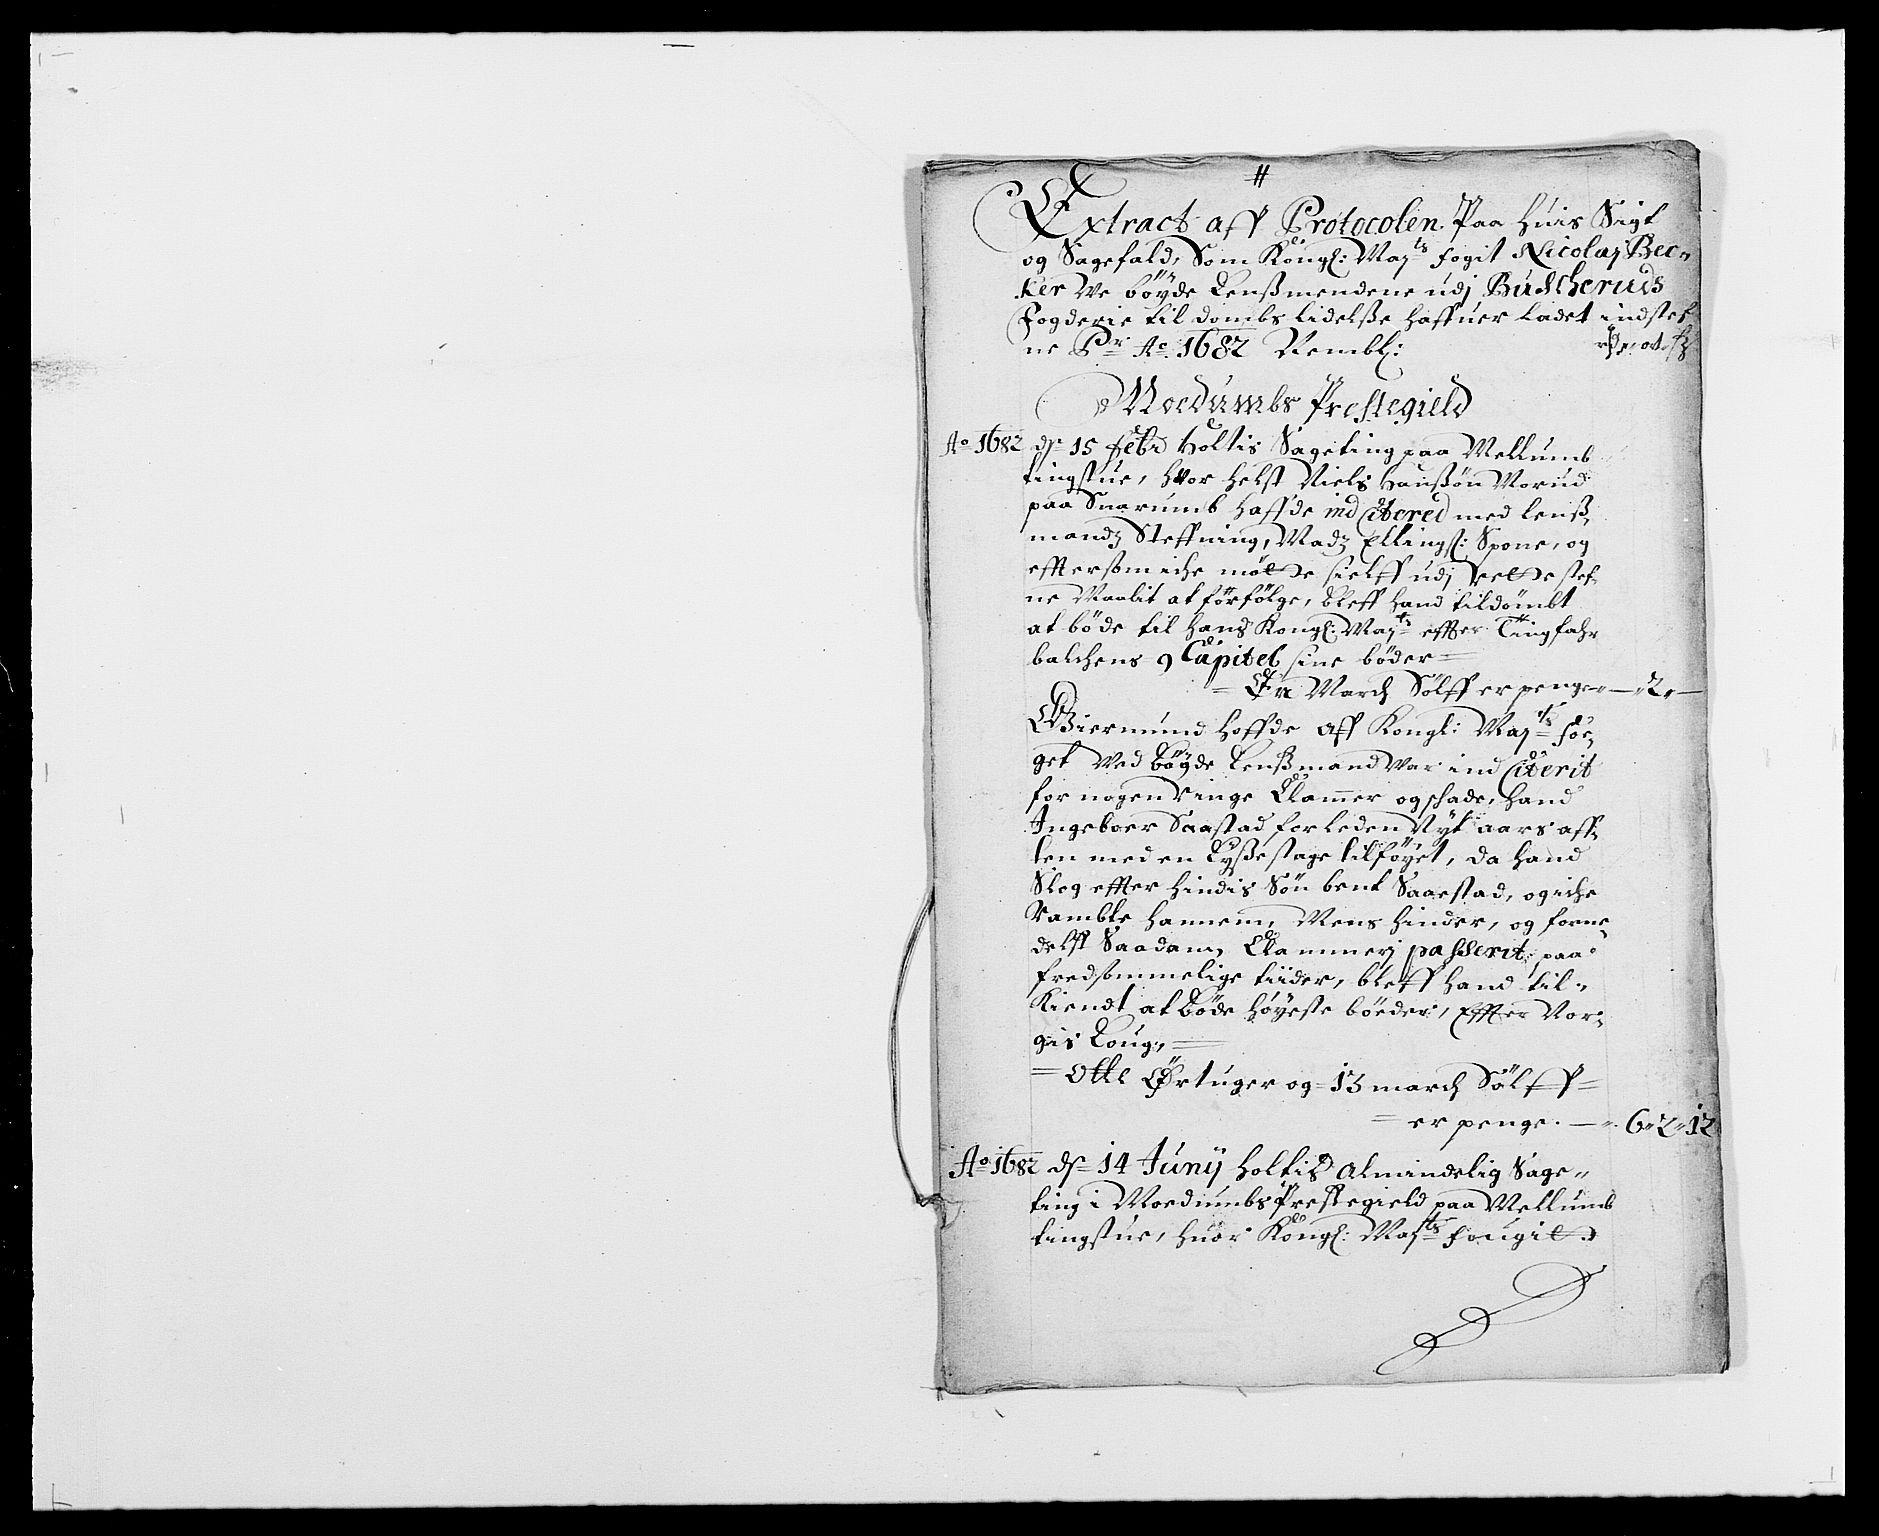 RA, Rentekammeret inntil 1814, Reviderte regnskaper, Fogderegnskap, R25/L1676: Fogderegnskap Buskerud, 1682, s. 23